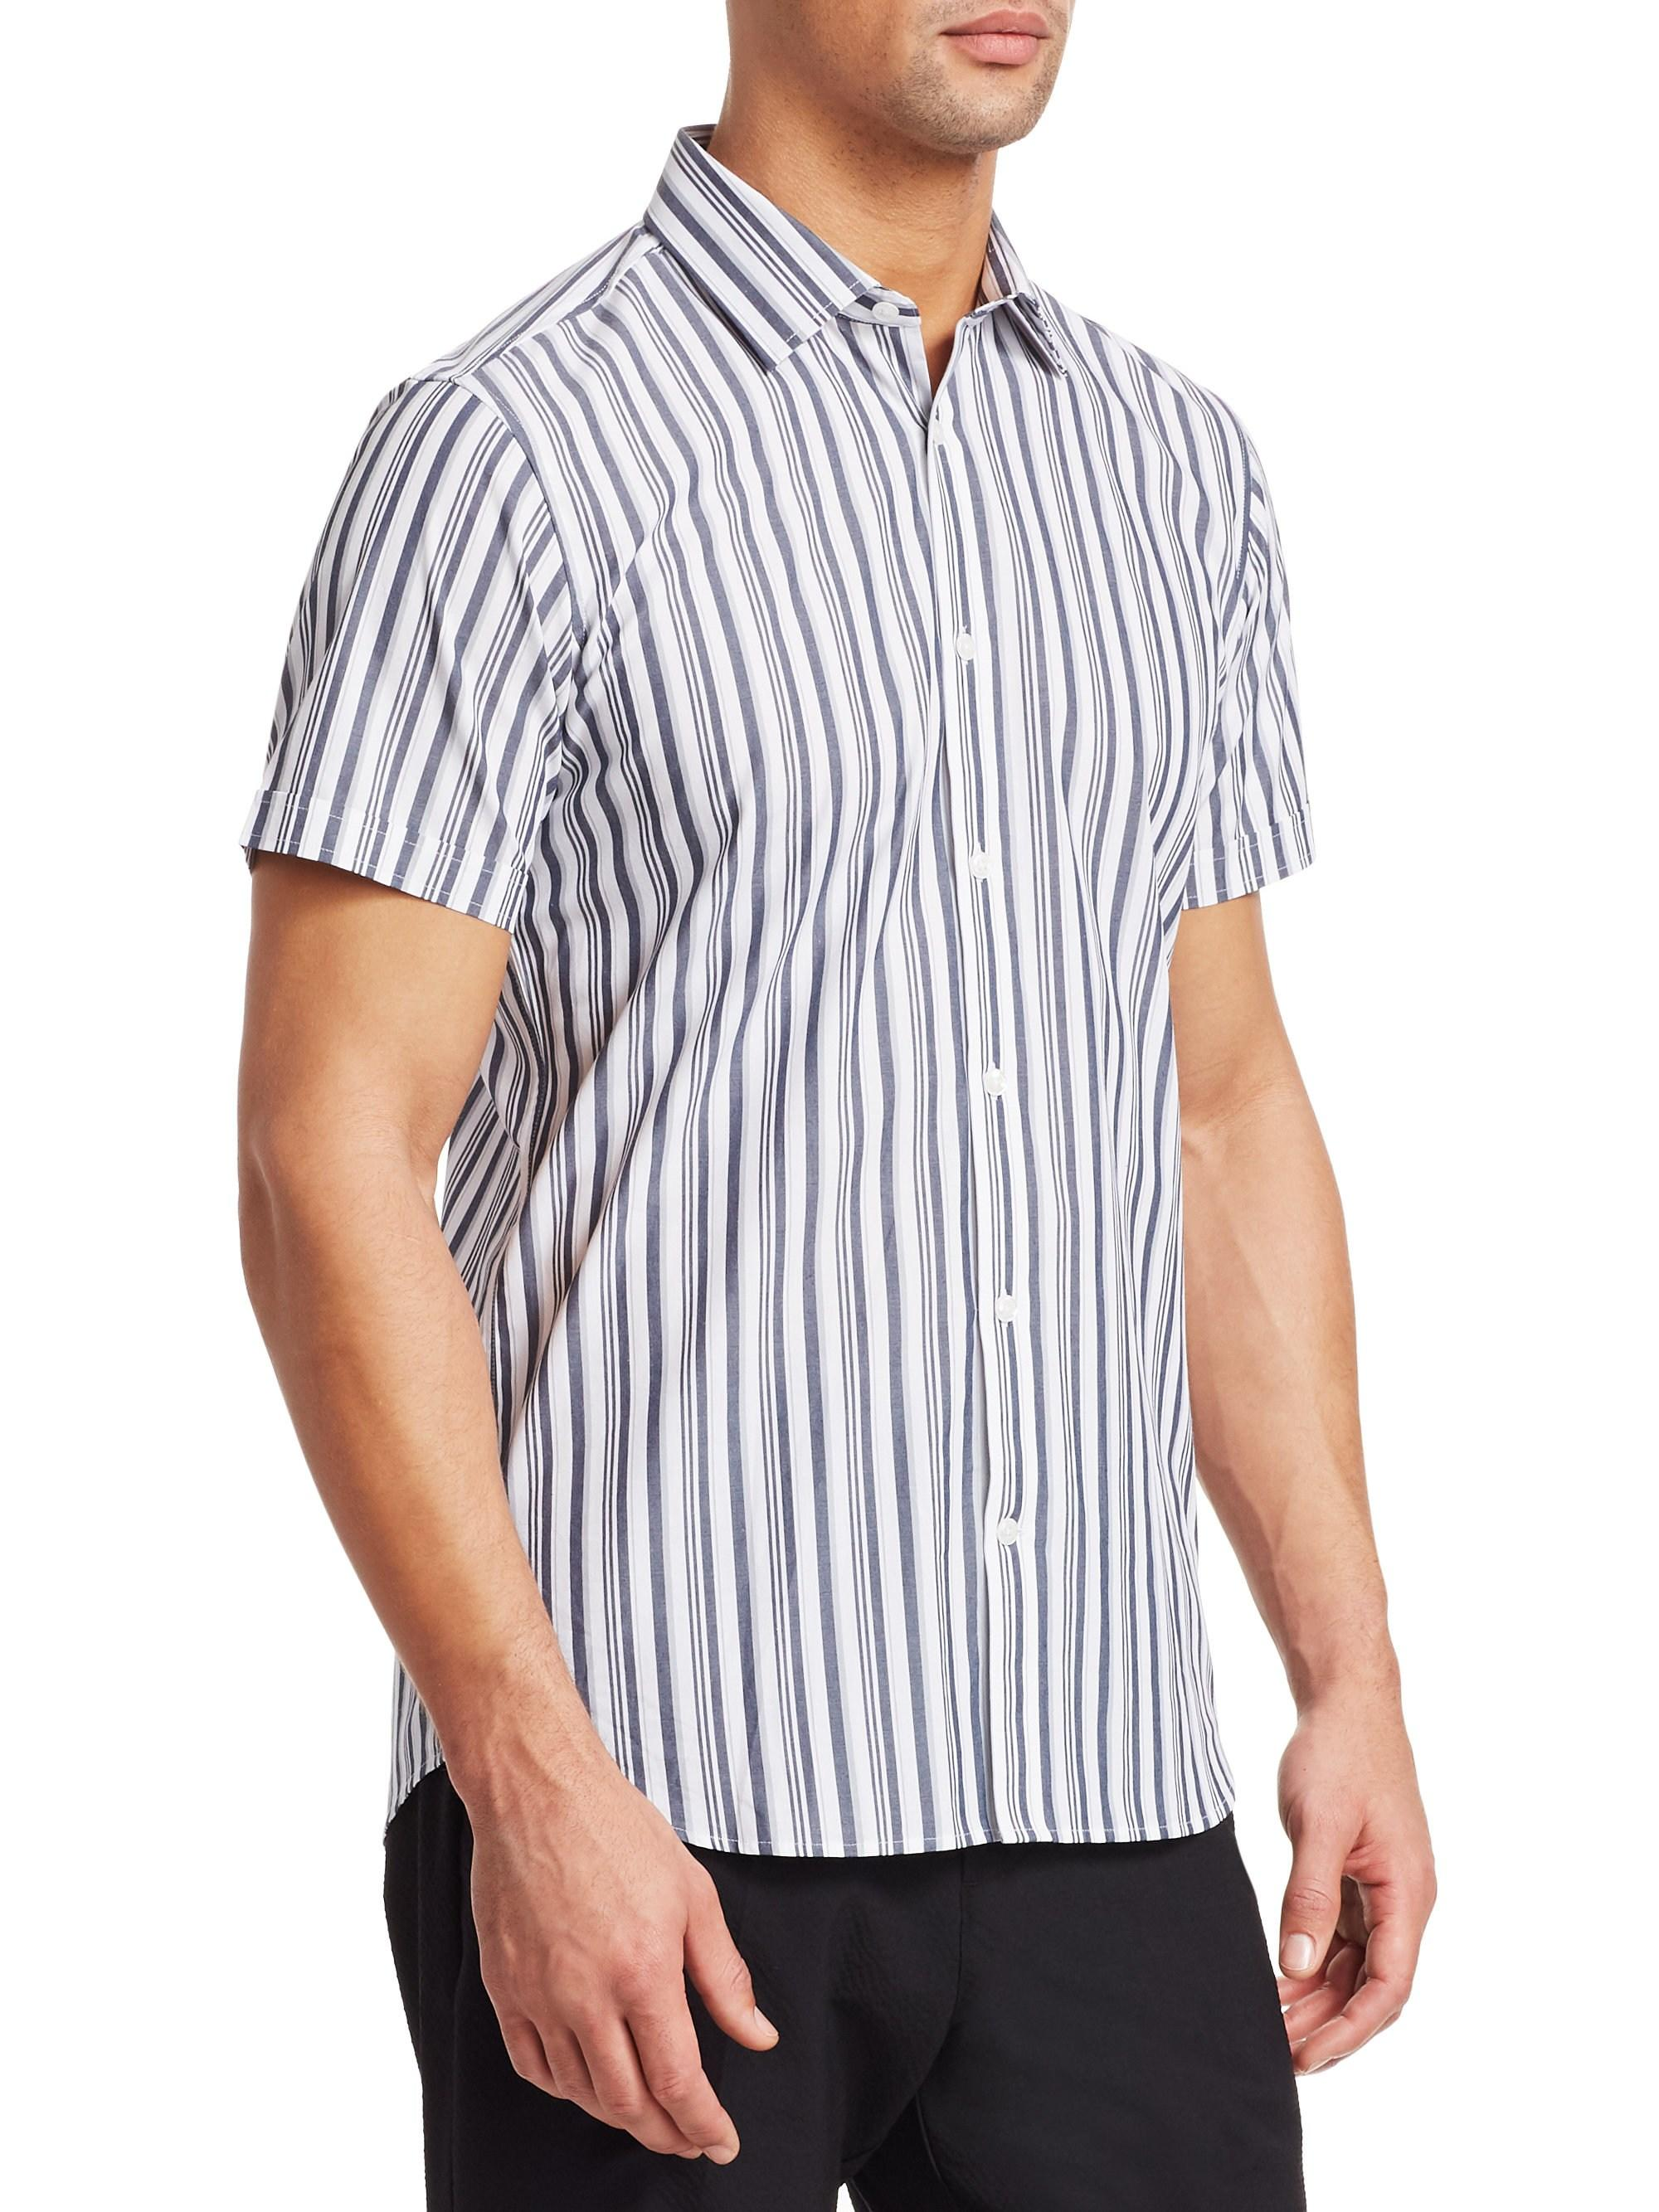 bac88d8f Saks Fifth Avenue Men's Modern Vertical Stripe Short-sleeve Shirt - White  Grey - Size Xxl in White for Men - Lyst